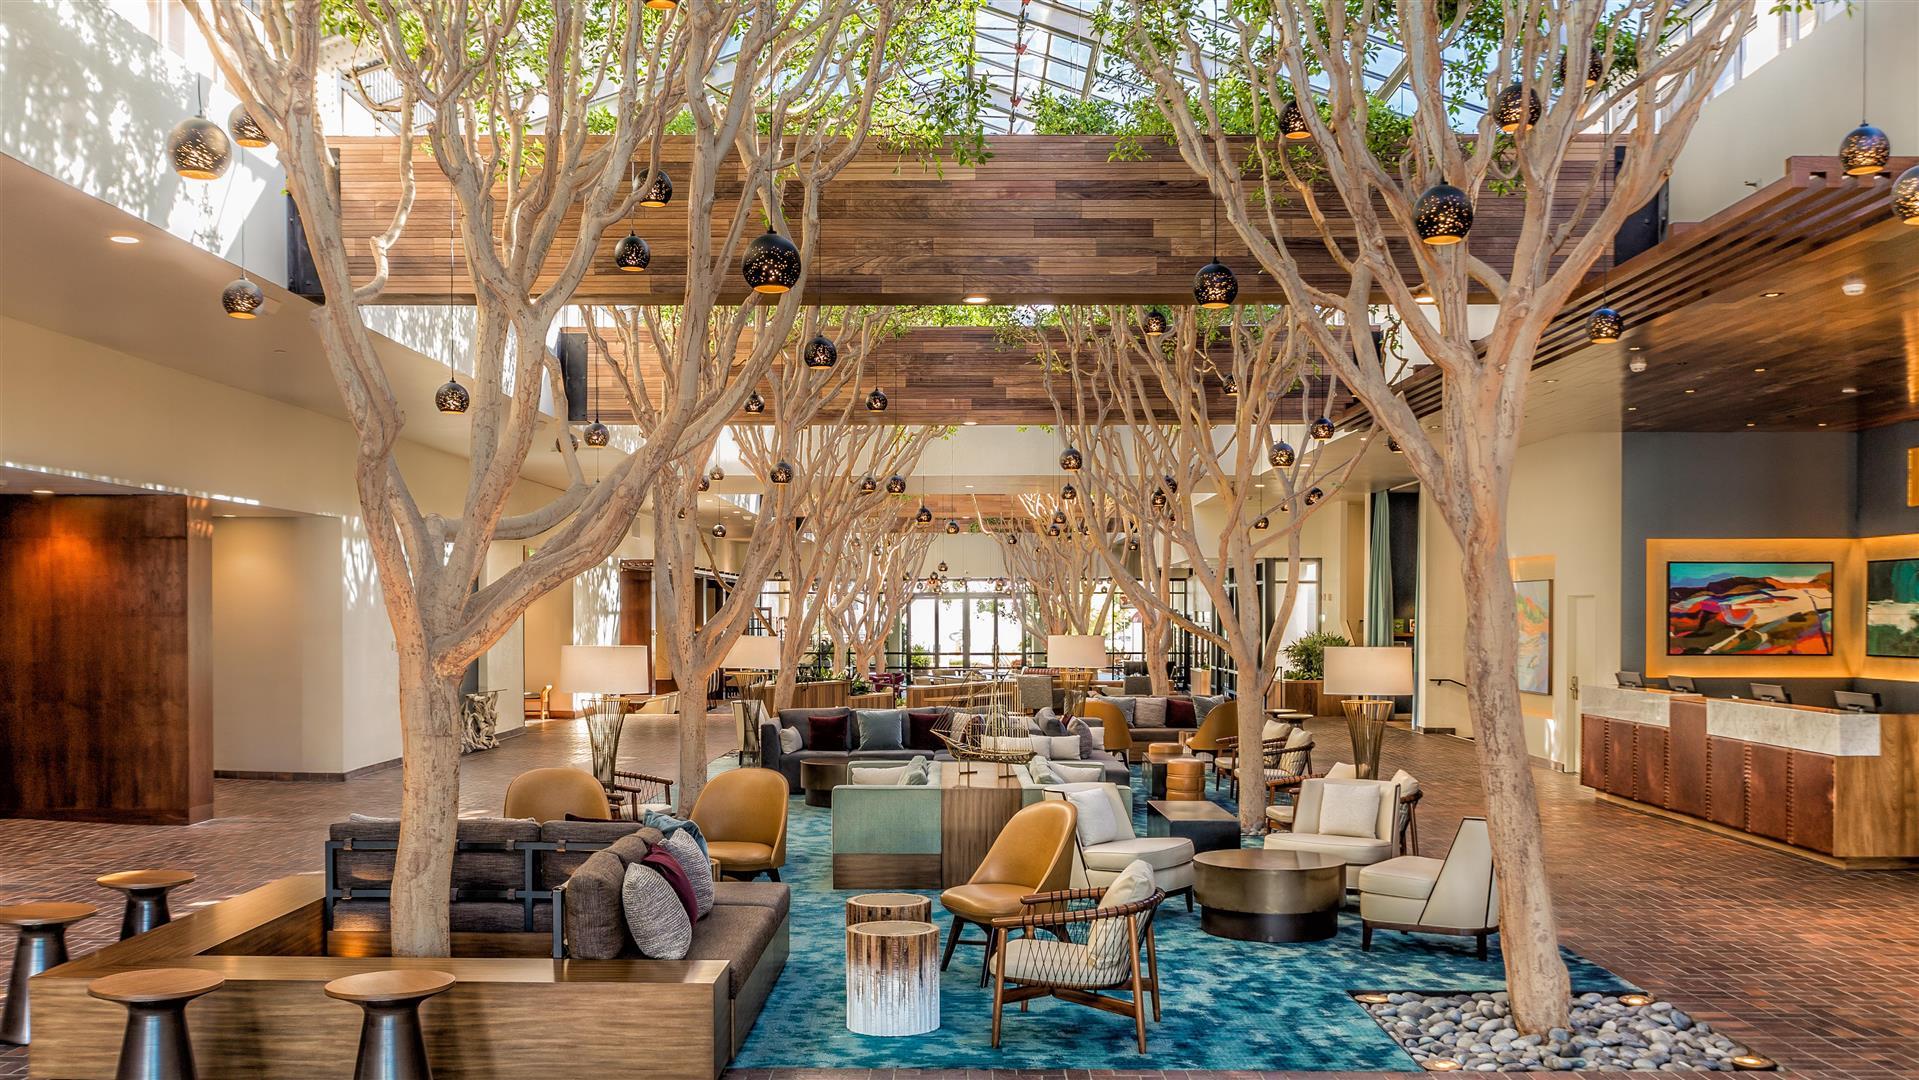 Meetings & Events at Portola Hotel & Spa at Monterey Bay Monterey